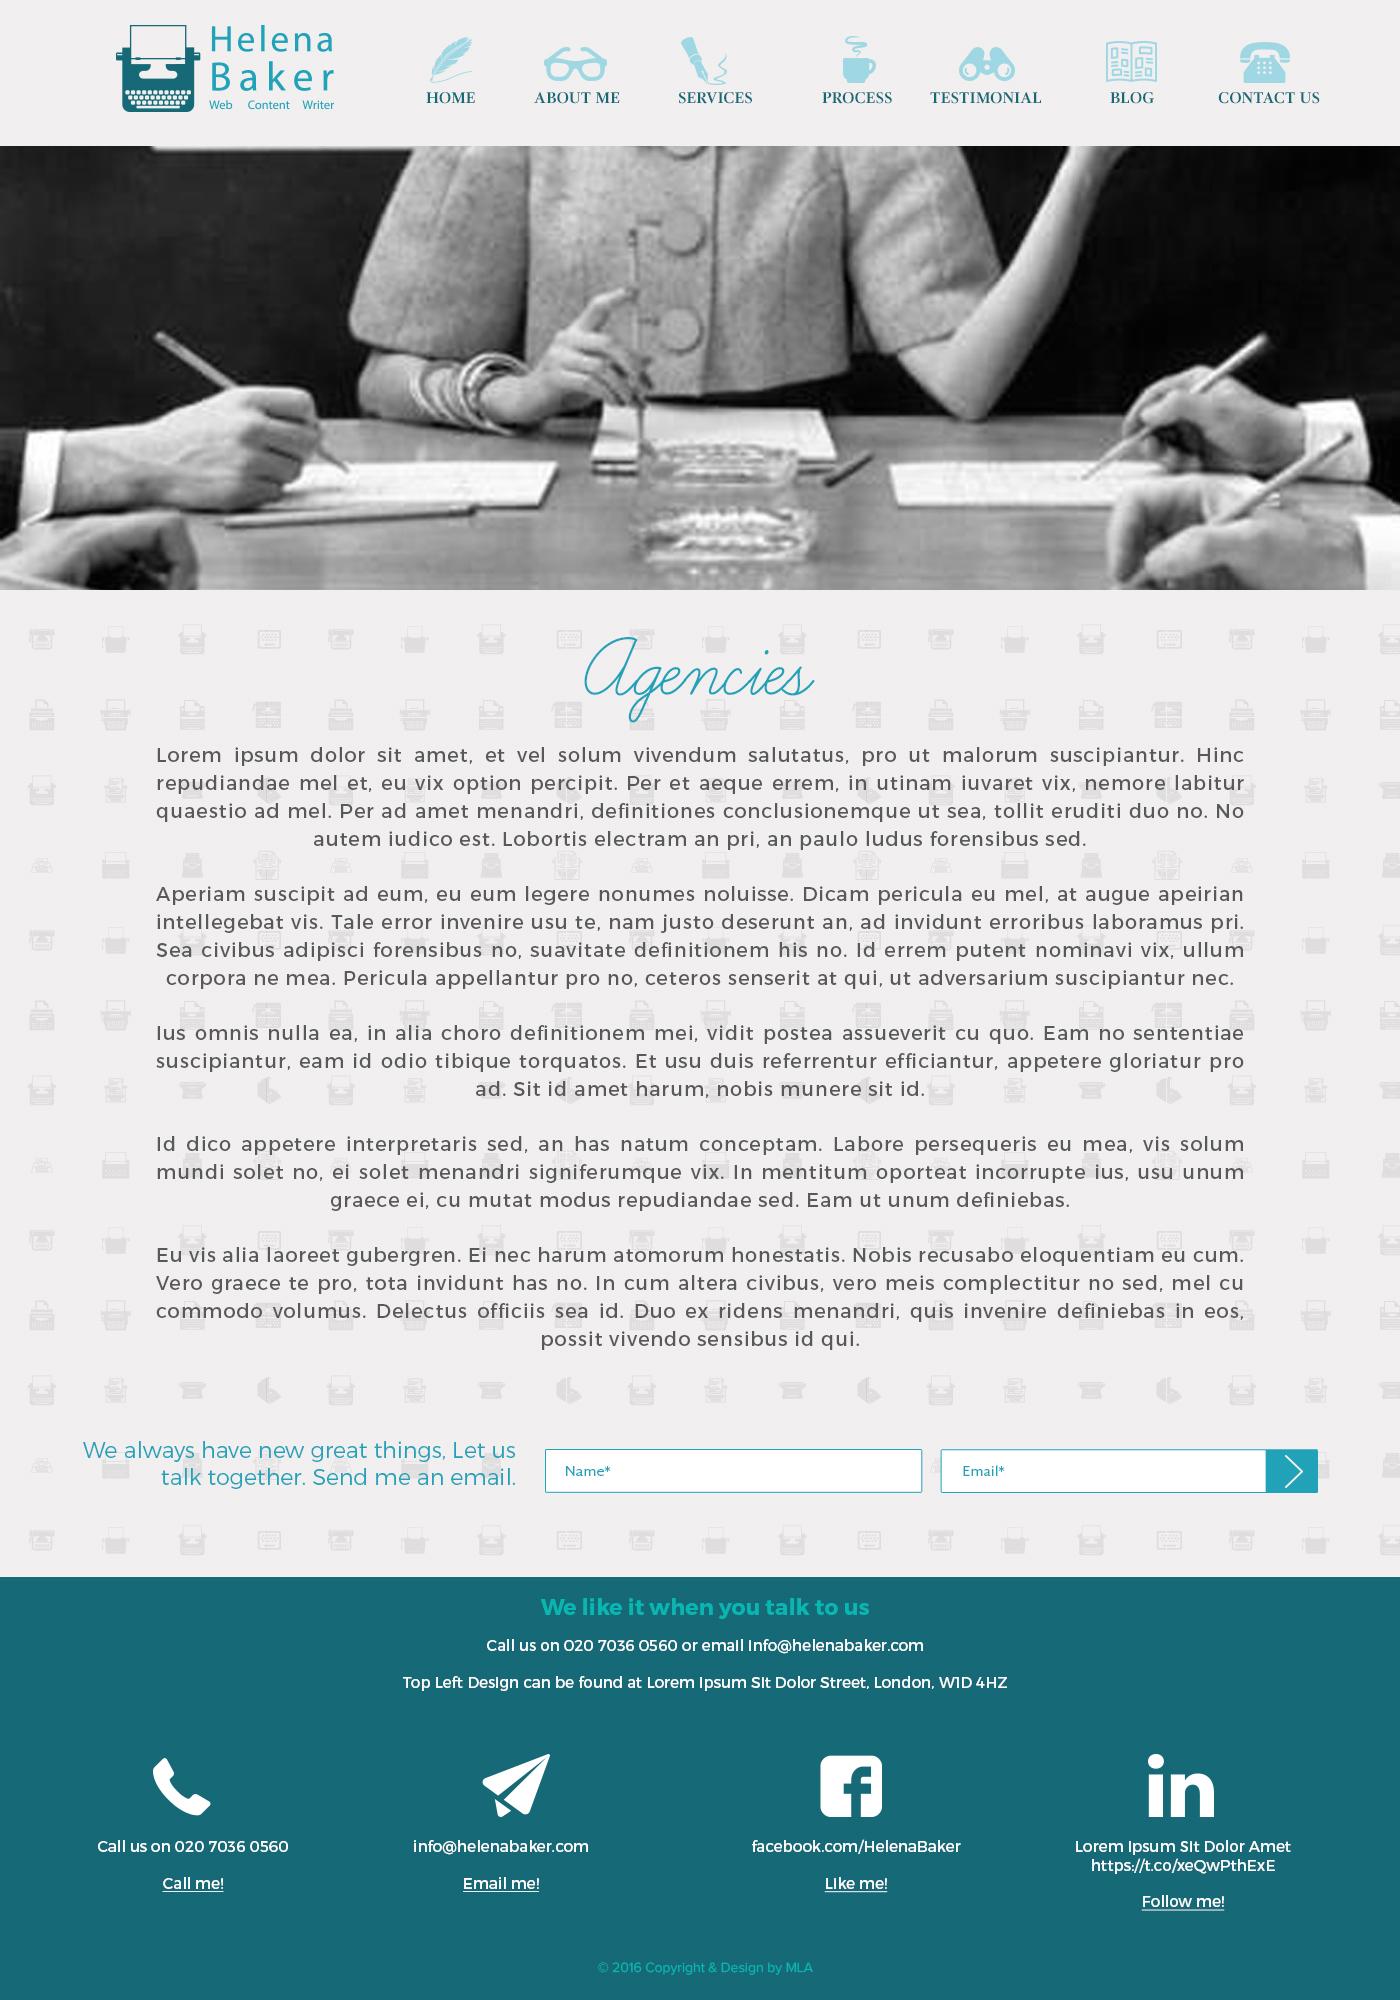 helena baker web design